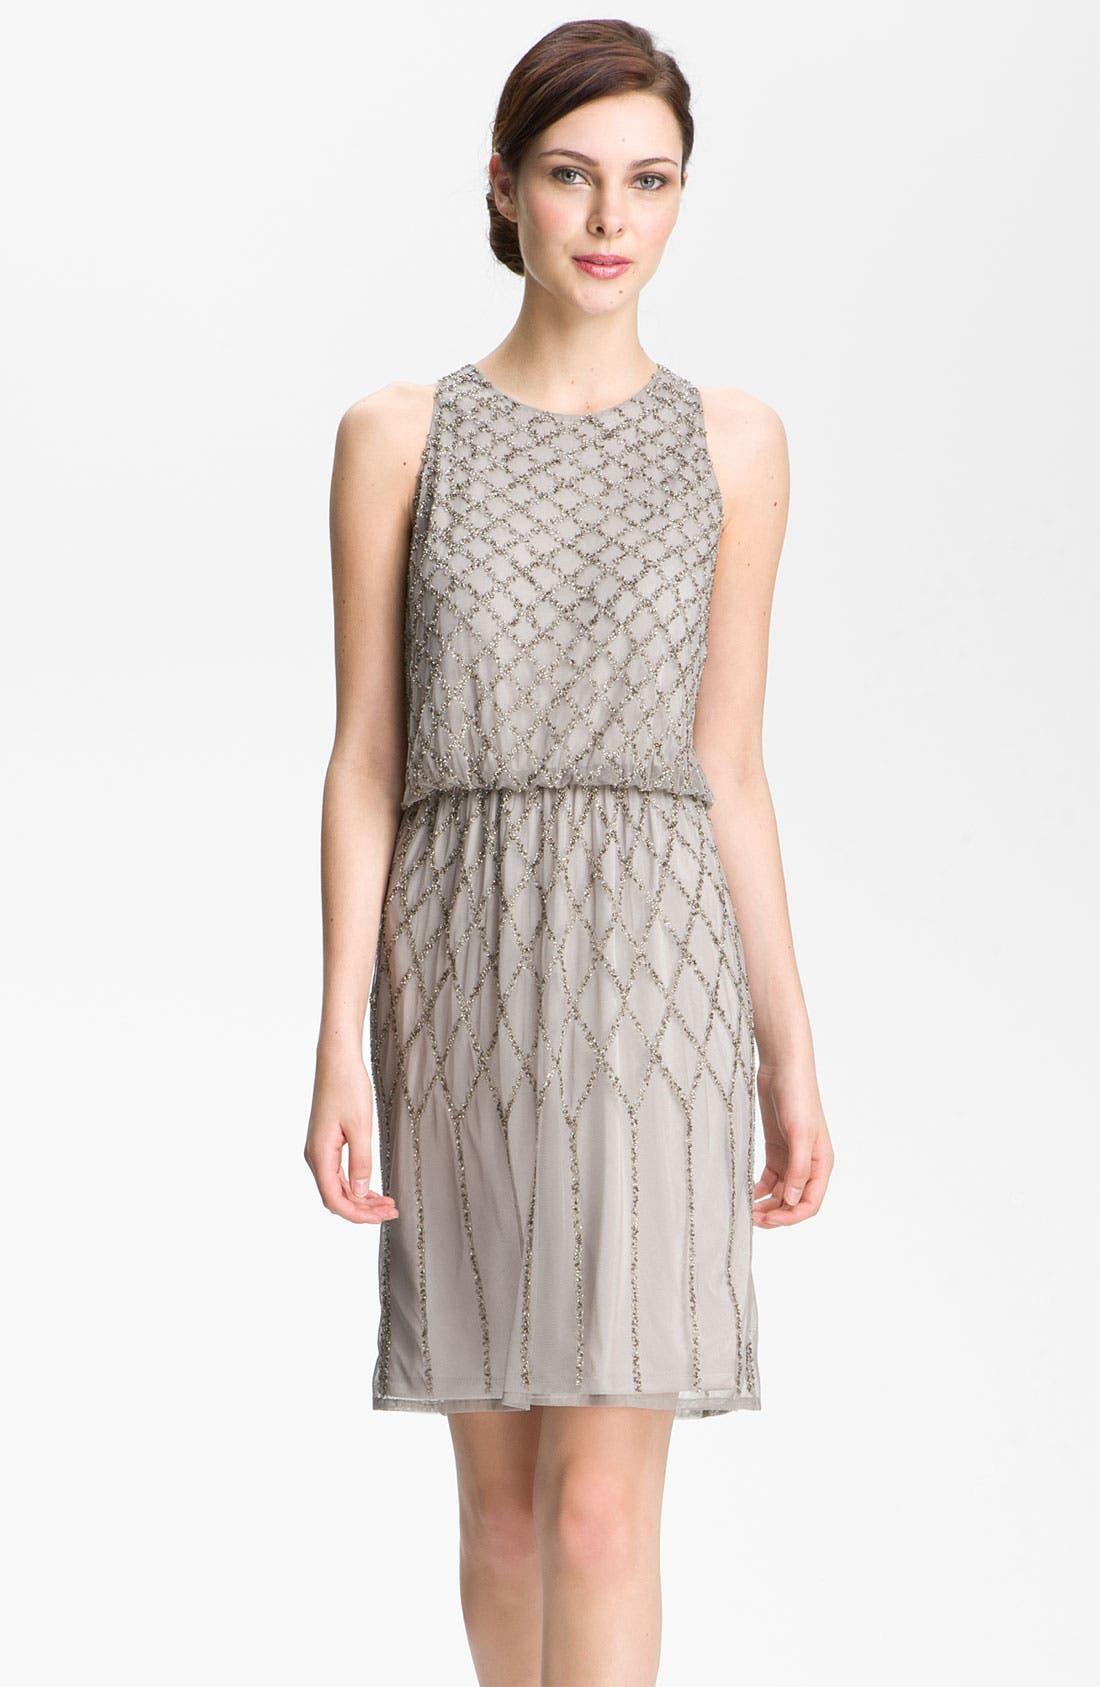 Alternate Image 1 Selected - Adrianna Papell Beaded Blouson Dress (Petite)